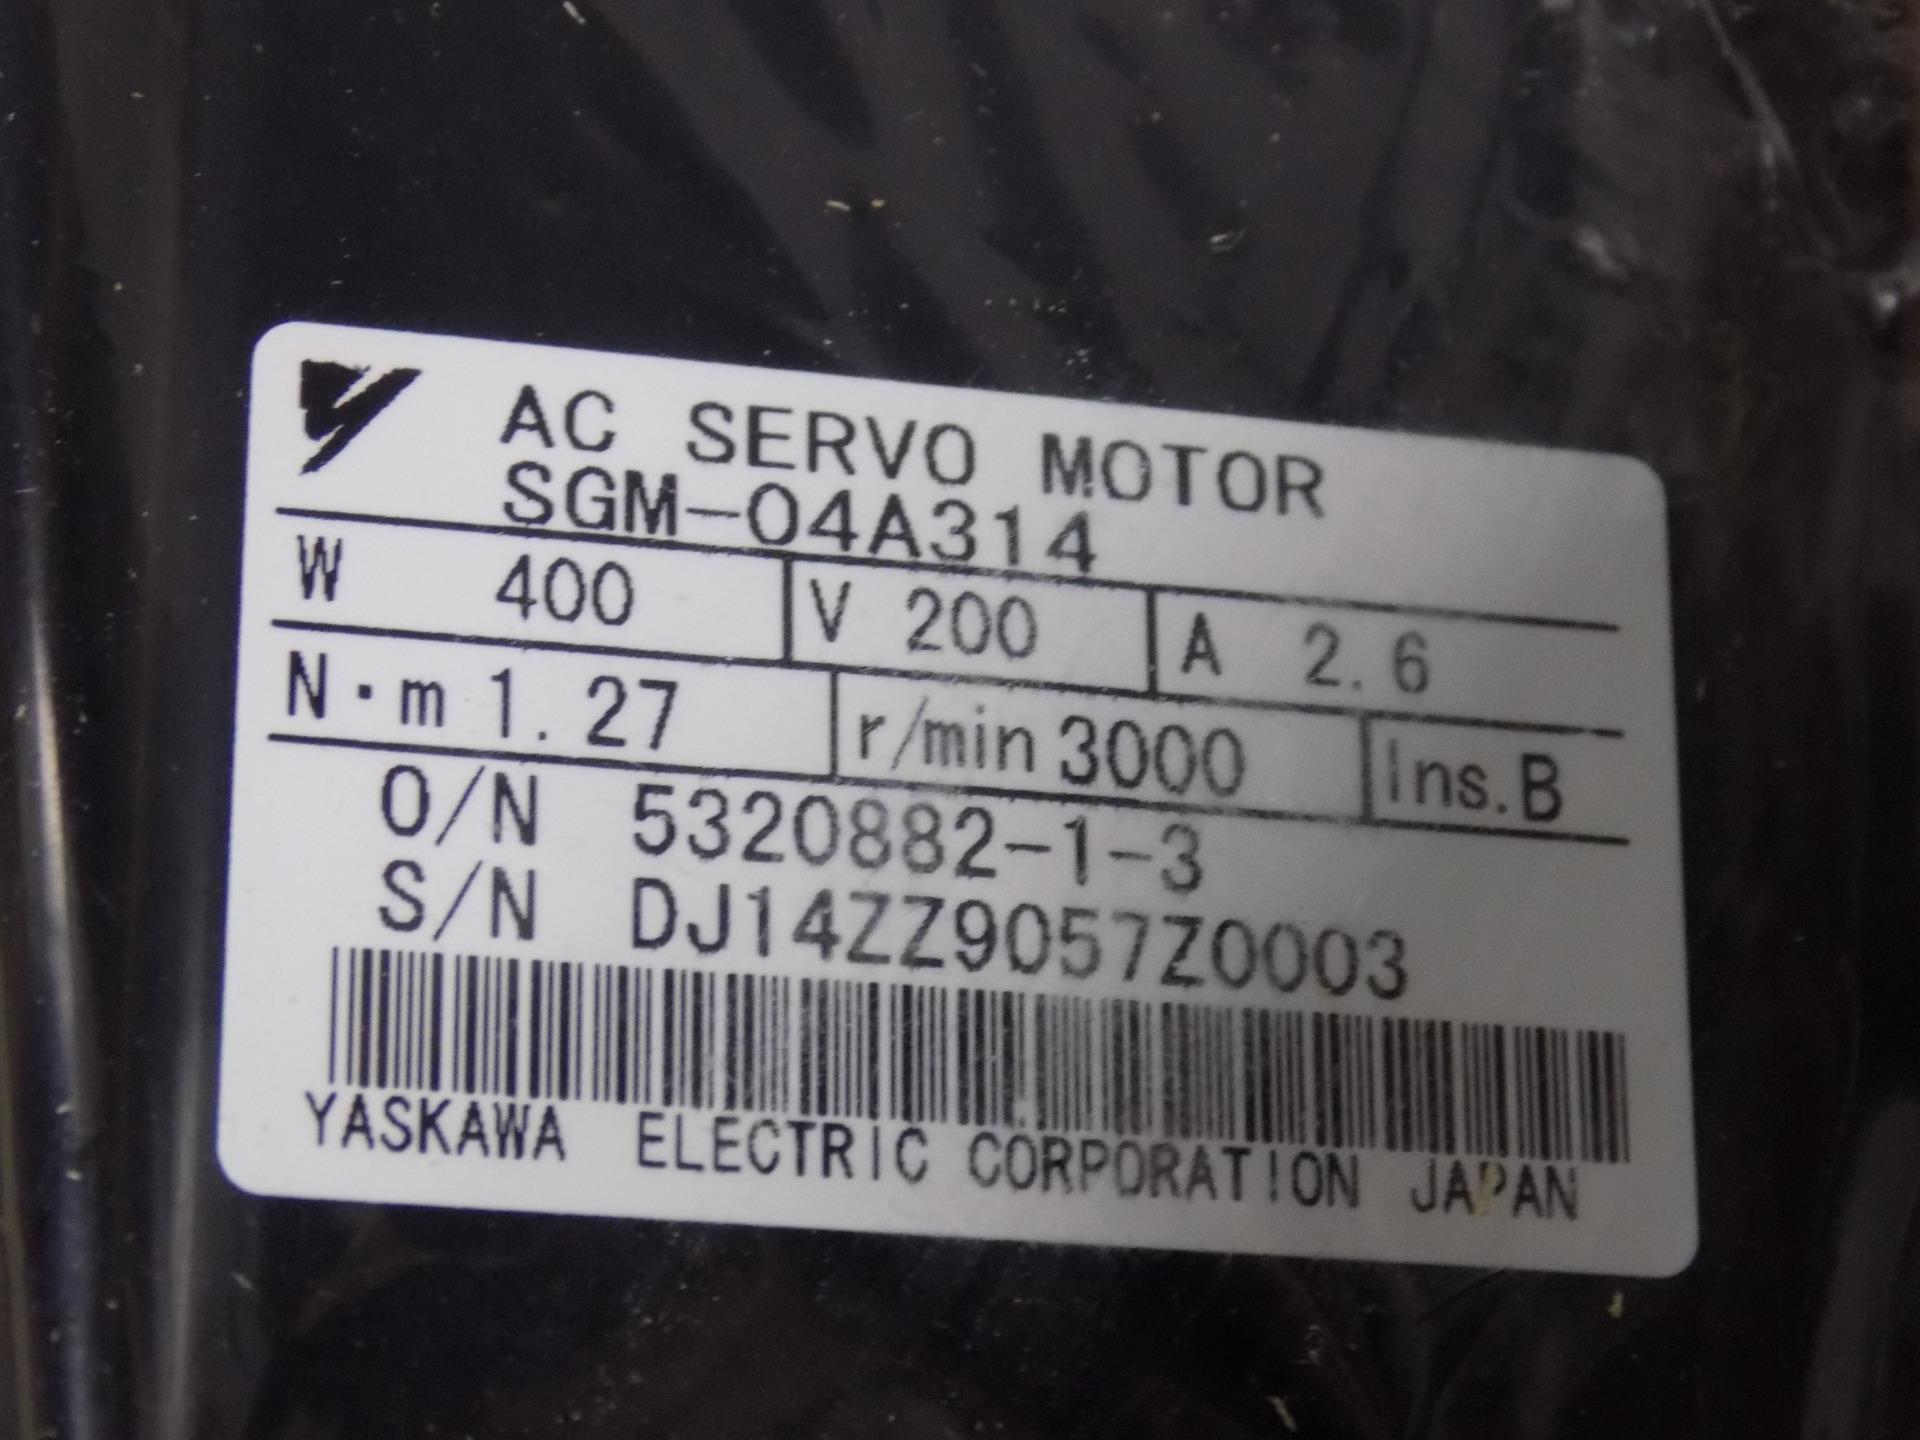 YASKAWA AC SERVO MOTOR SGM-04A314 NIB Automation, Motors & Drives